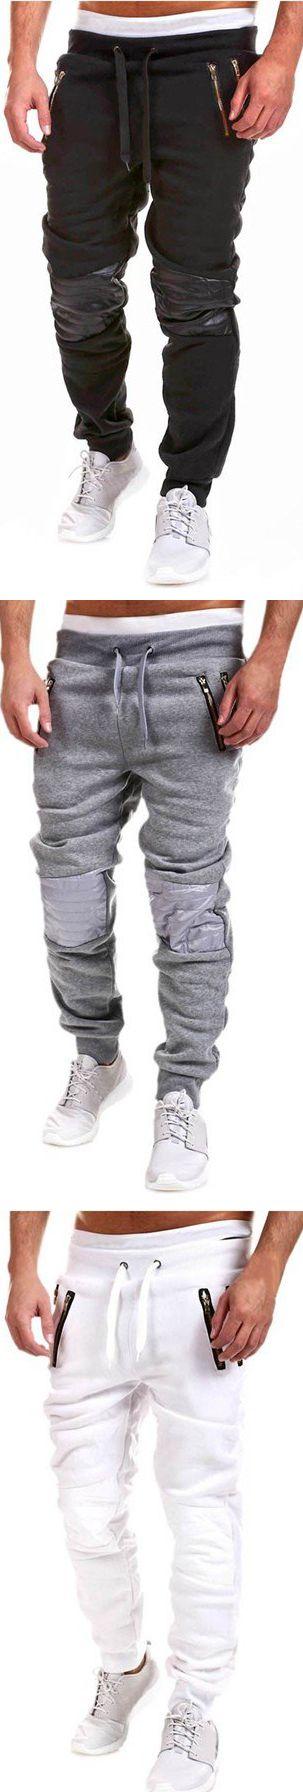 Men's Casual Jogger Dance Sportwear Baggy Harem Pants Slim Trousers Sweatpants